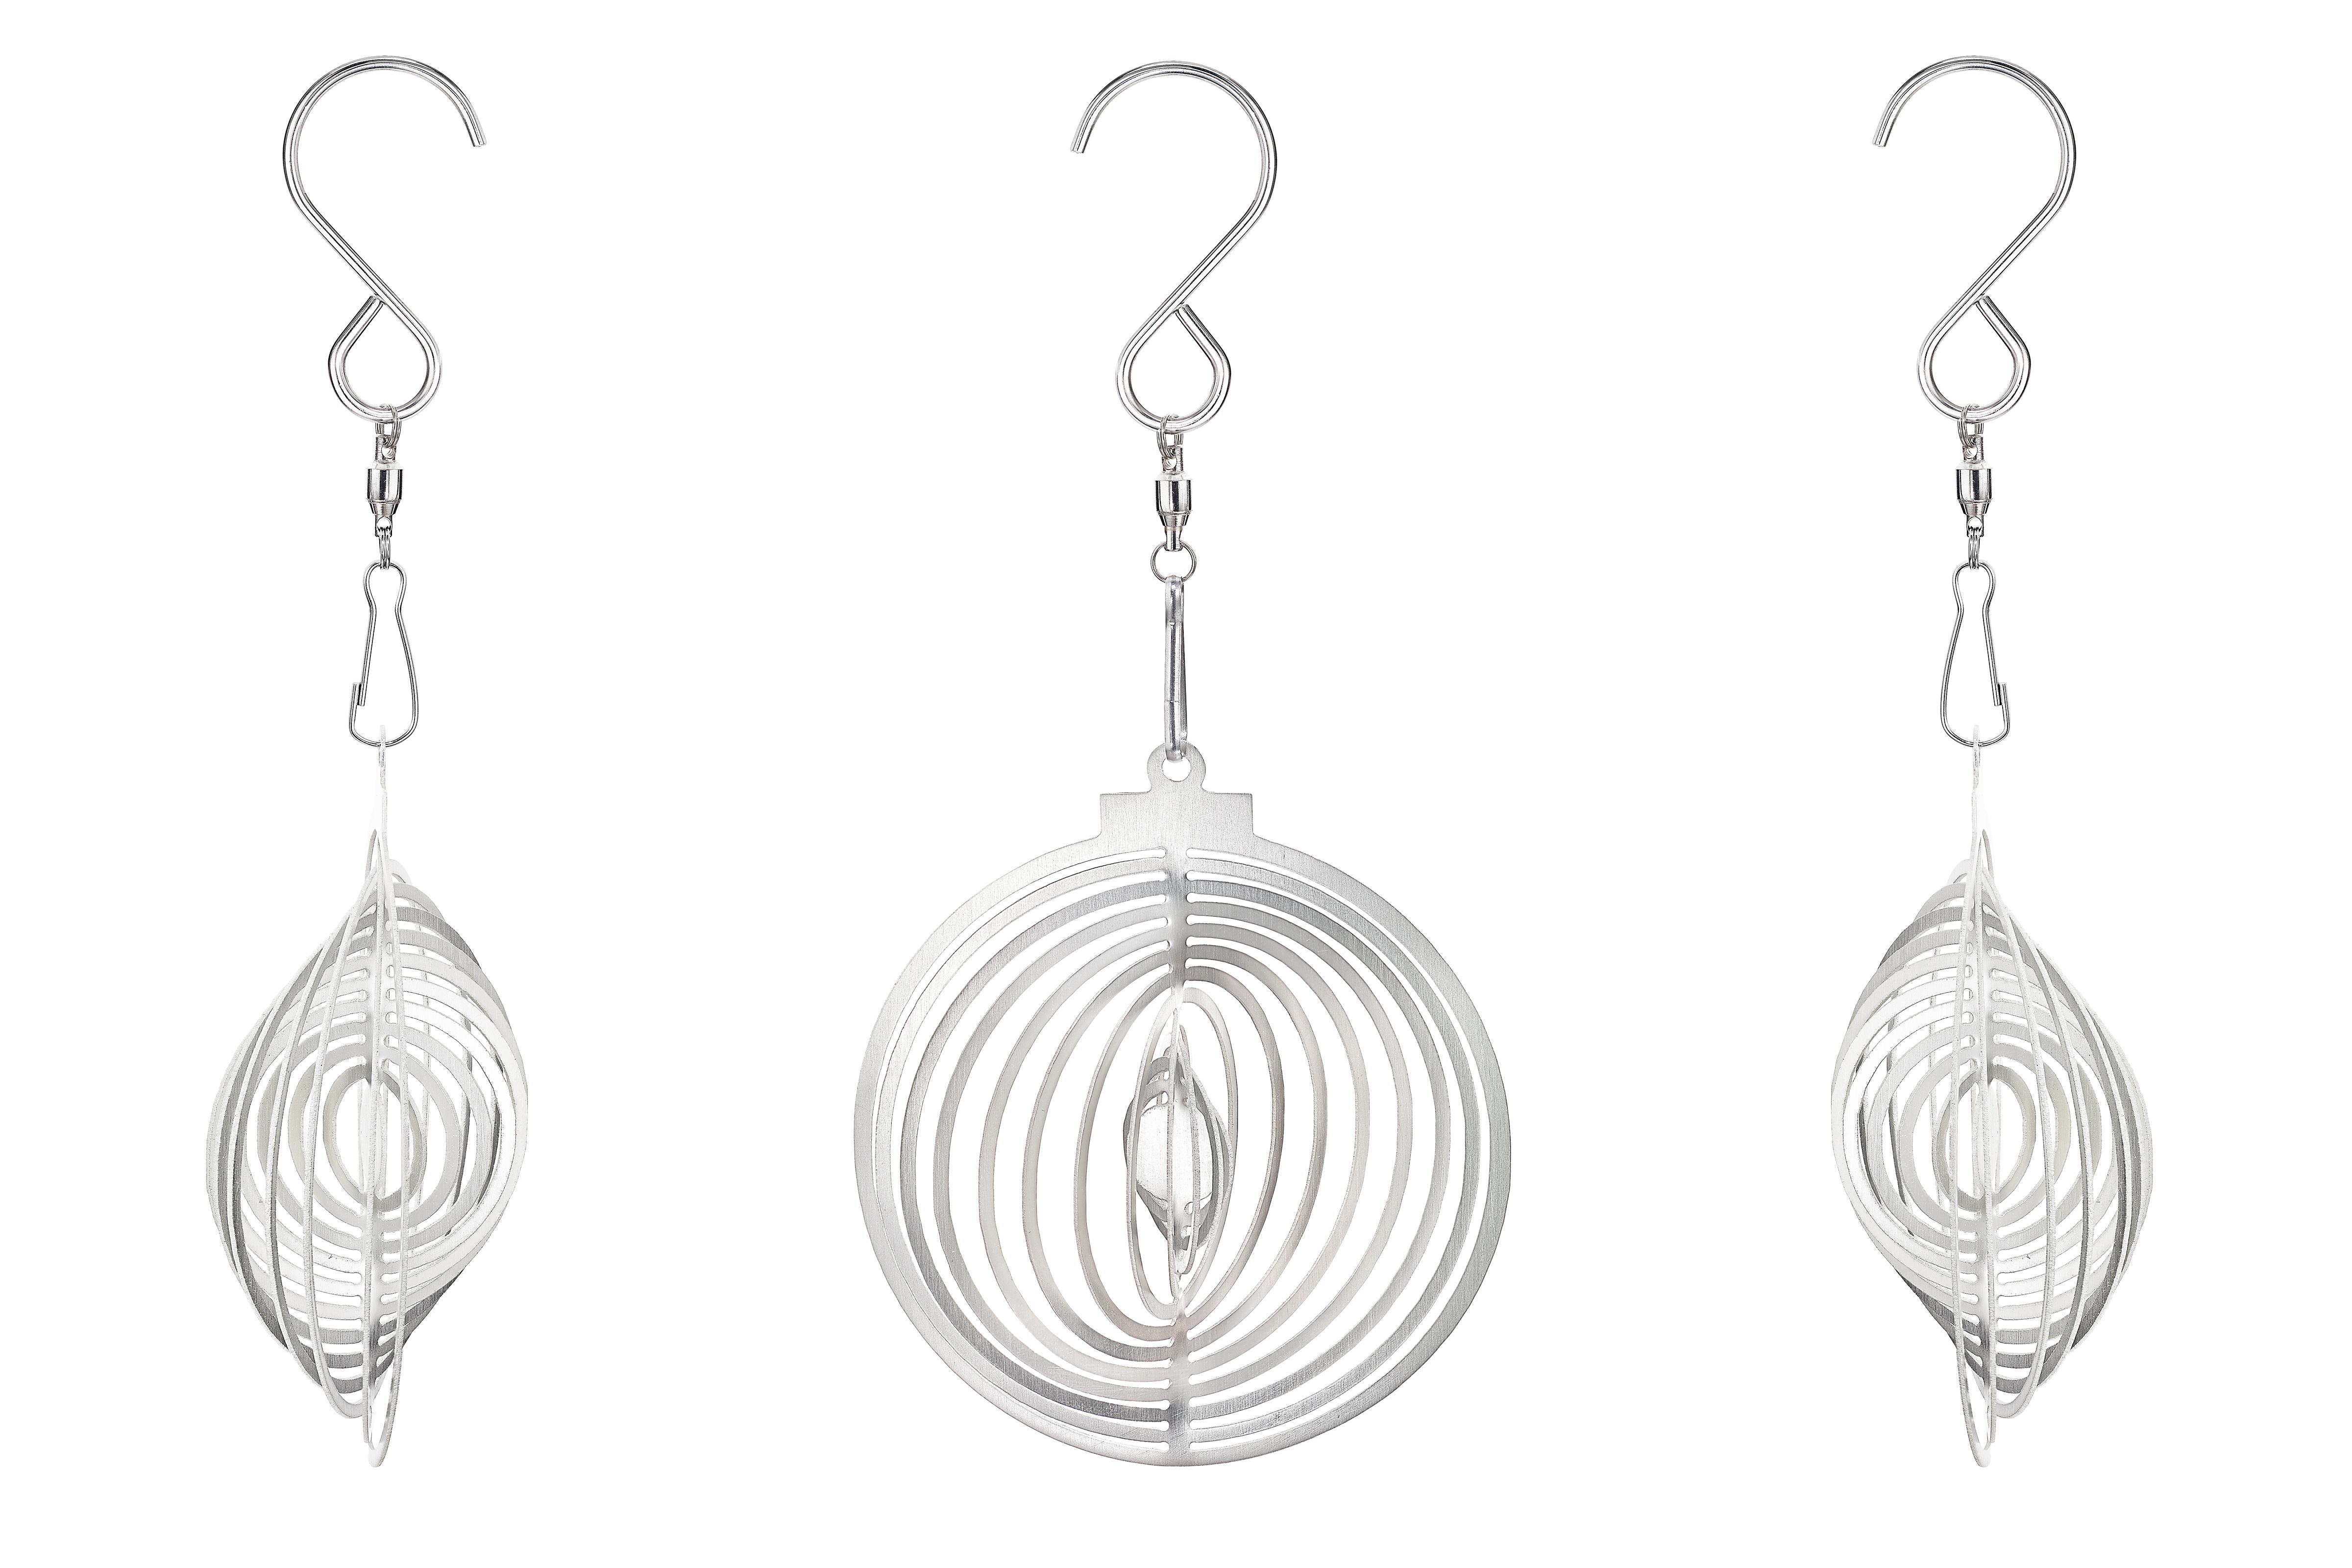 Twistmas Decoration – Brilliant Bauble 2 – Copyright BJRdesigns